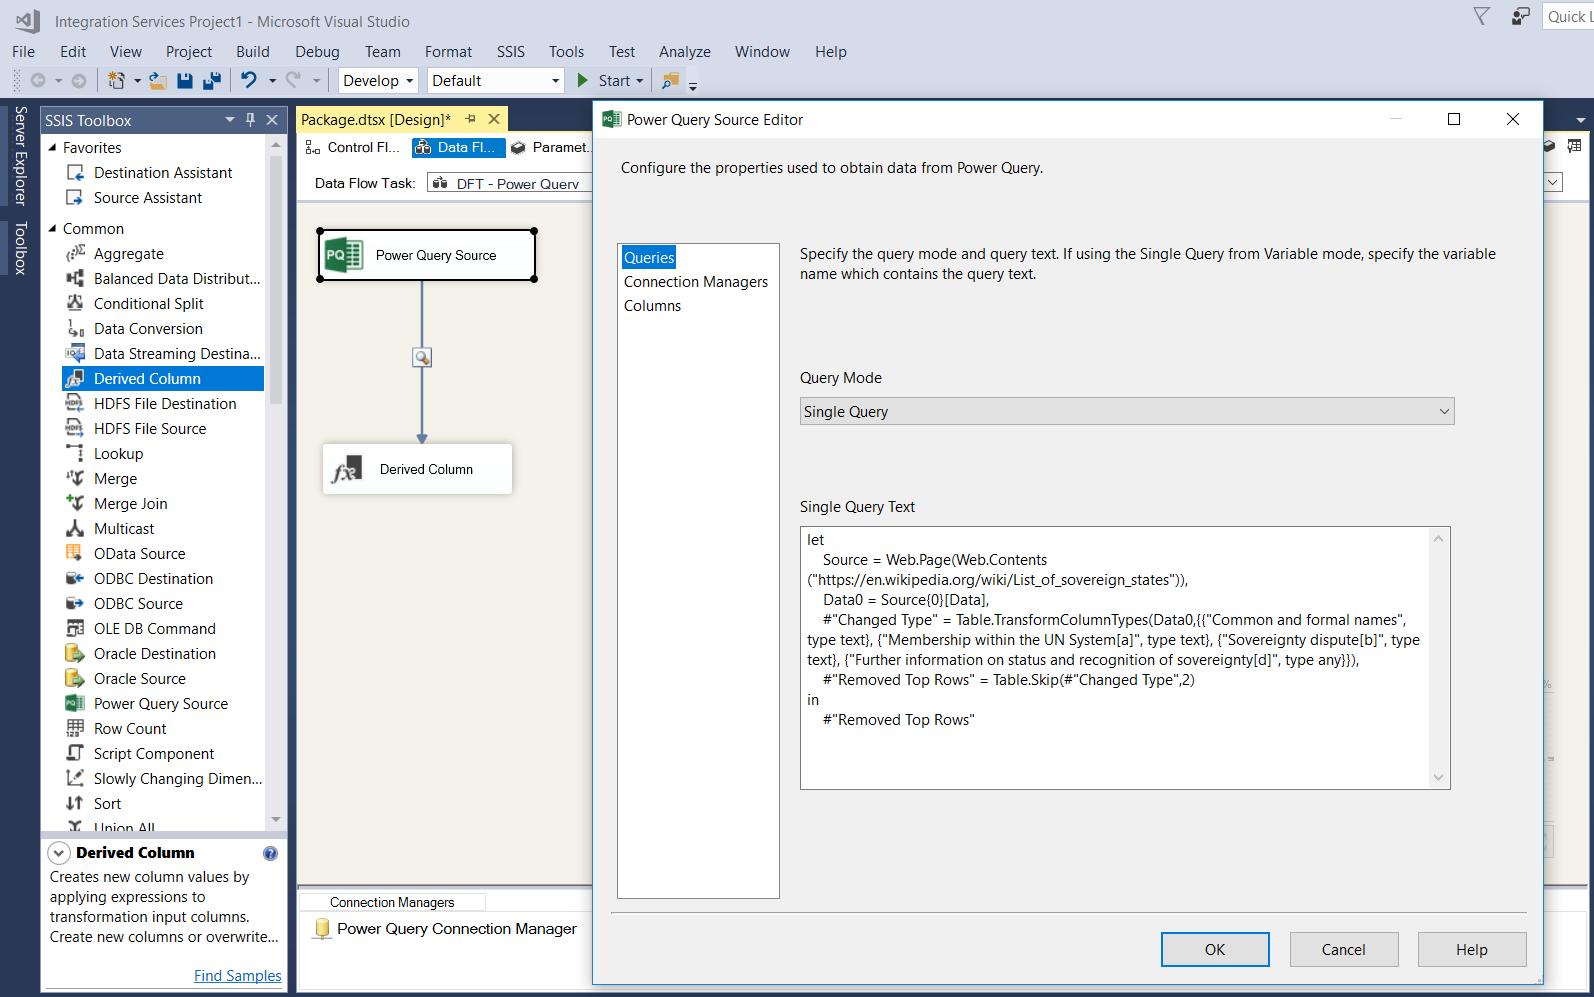 Microsoft SQL Server Integration Services: Power Query